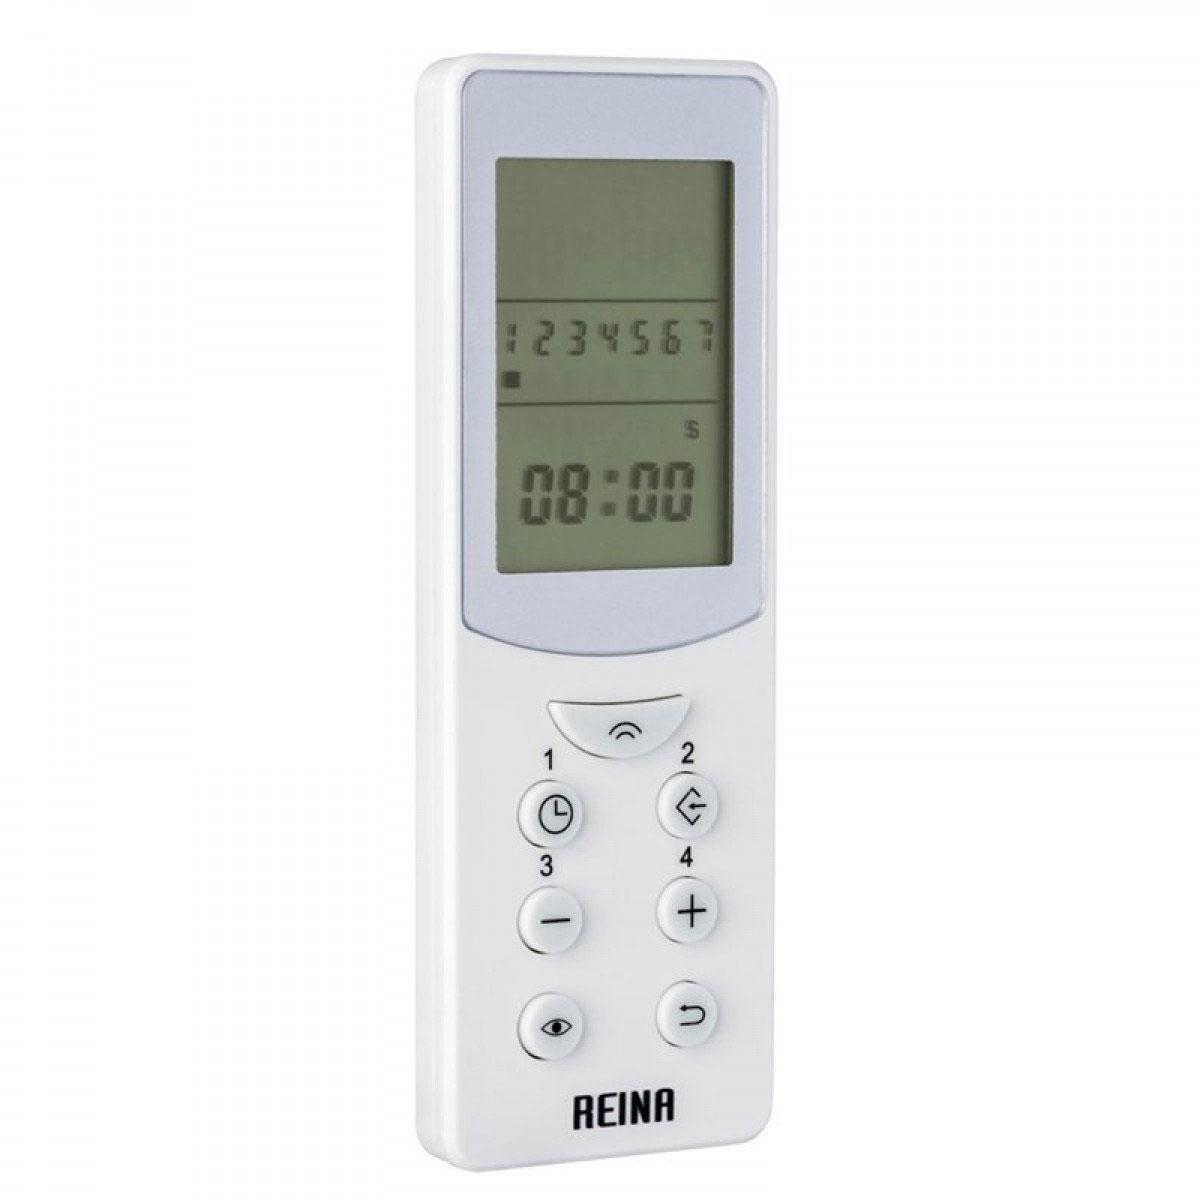 Reina Capo Straight Thermostatic Electric Heated Towel Rail 1600mm H x 400mm W Chrome